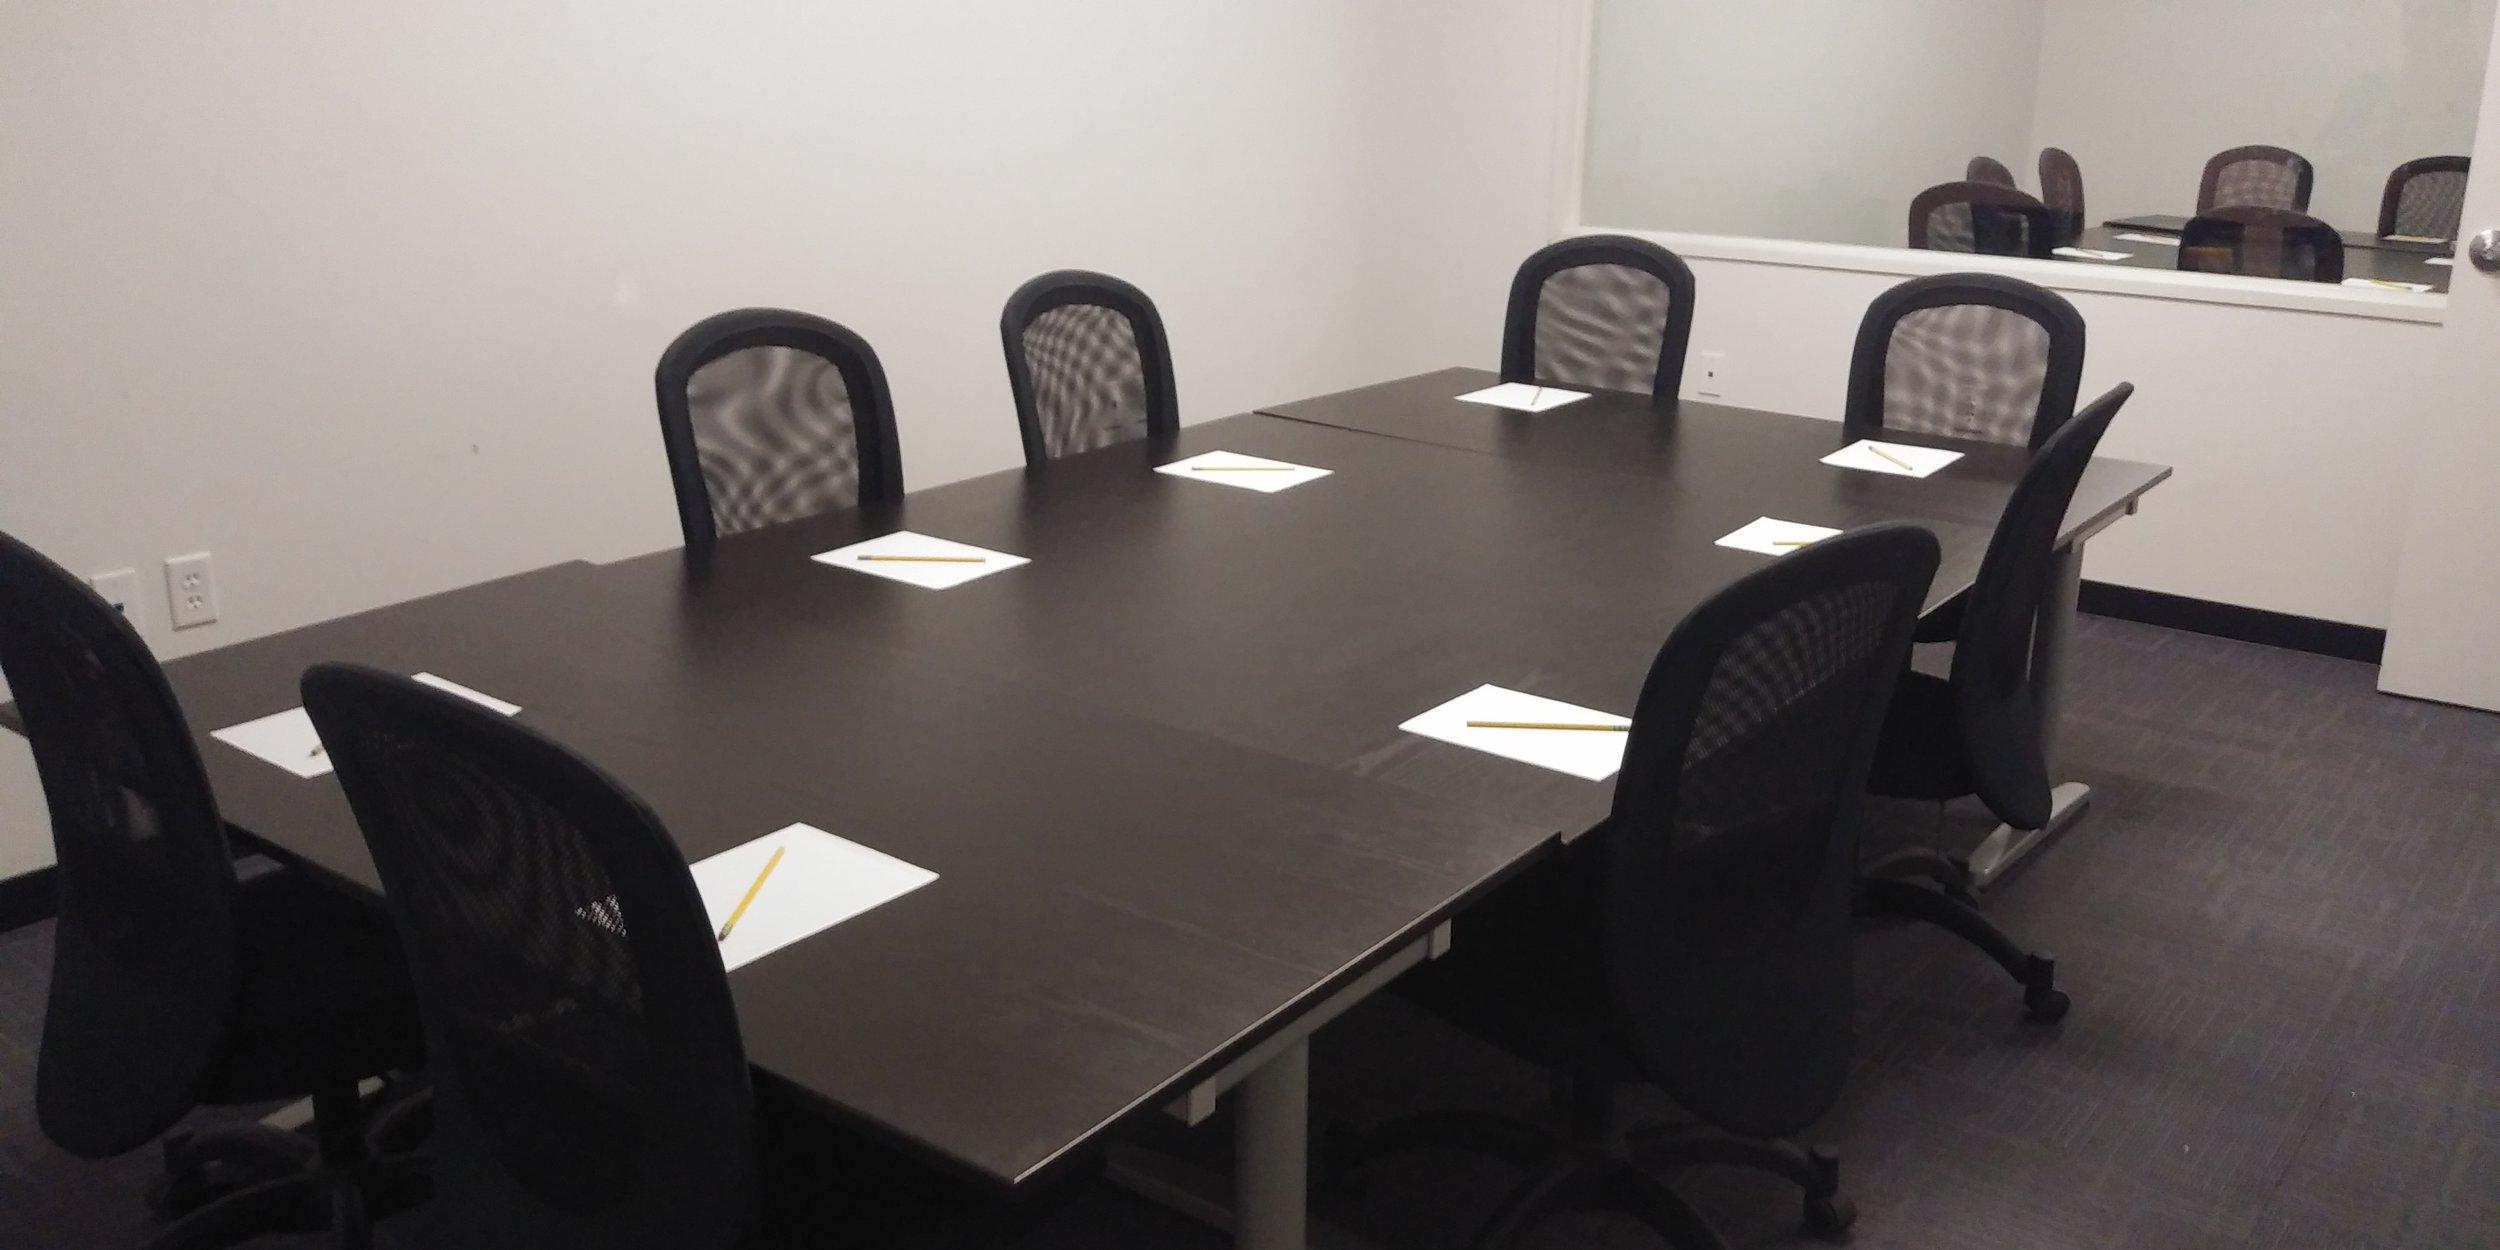 Focus Group Set-Up